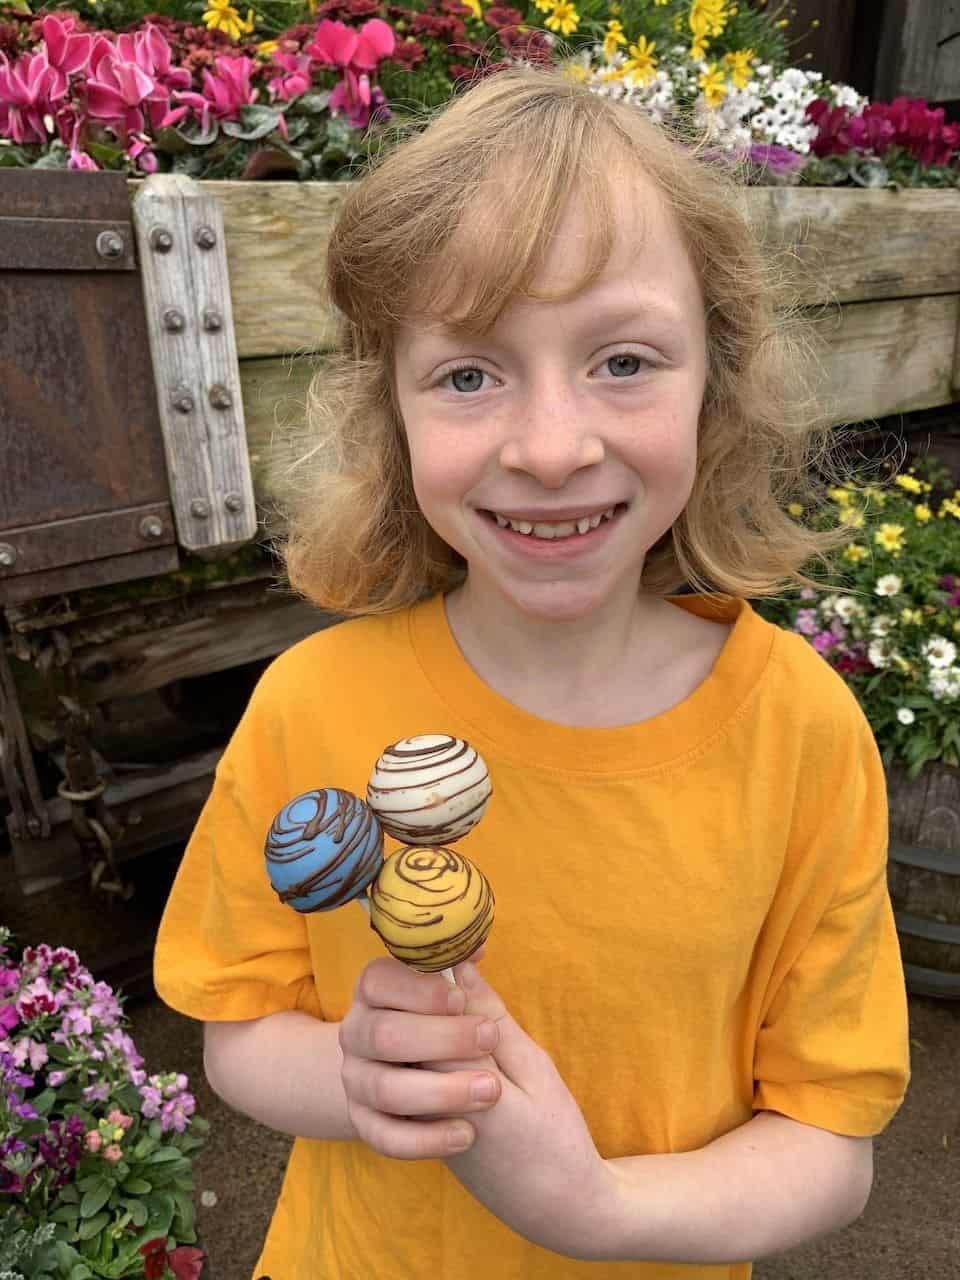 Cake Pops at Knotts